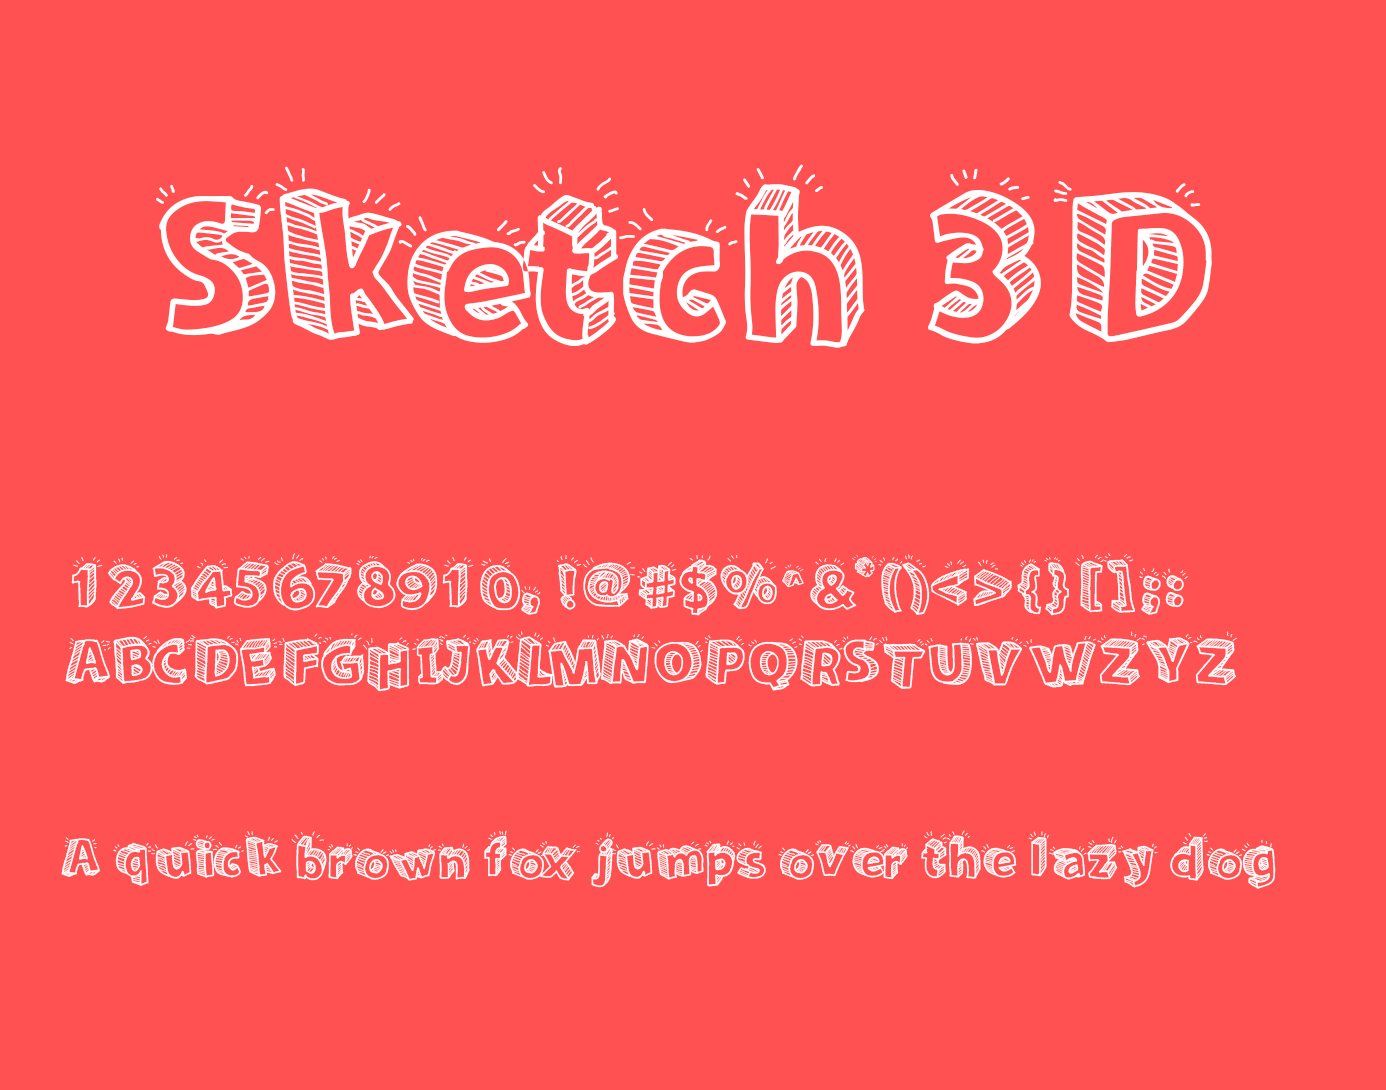 sketch 3d